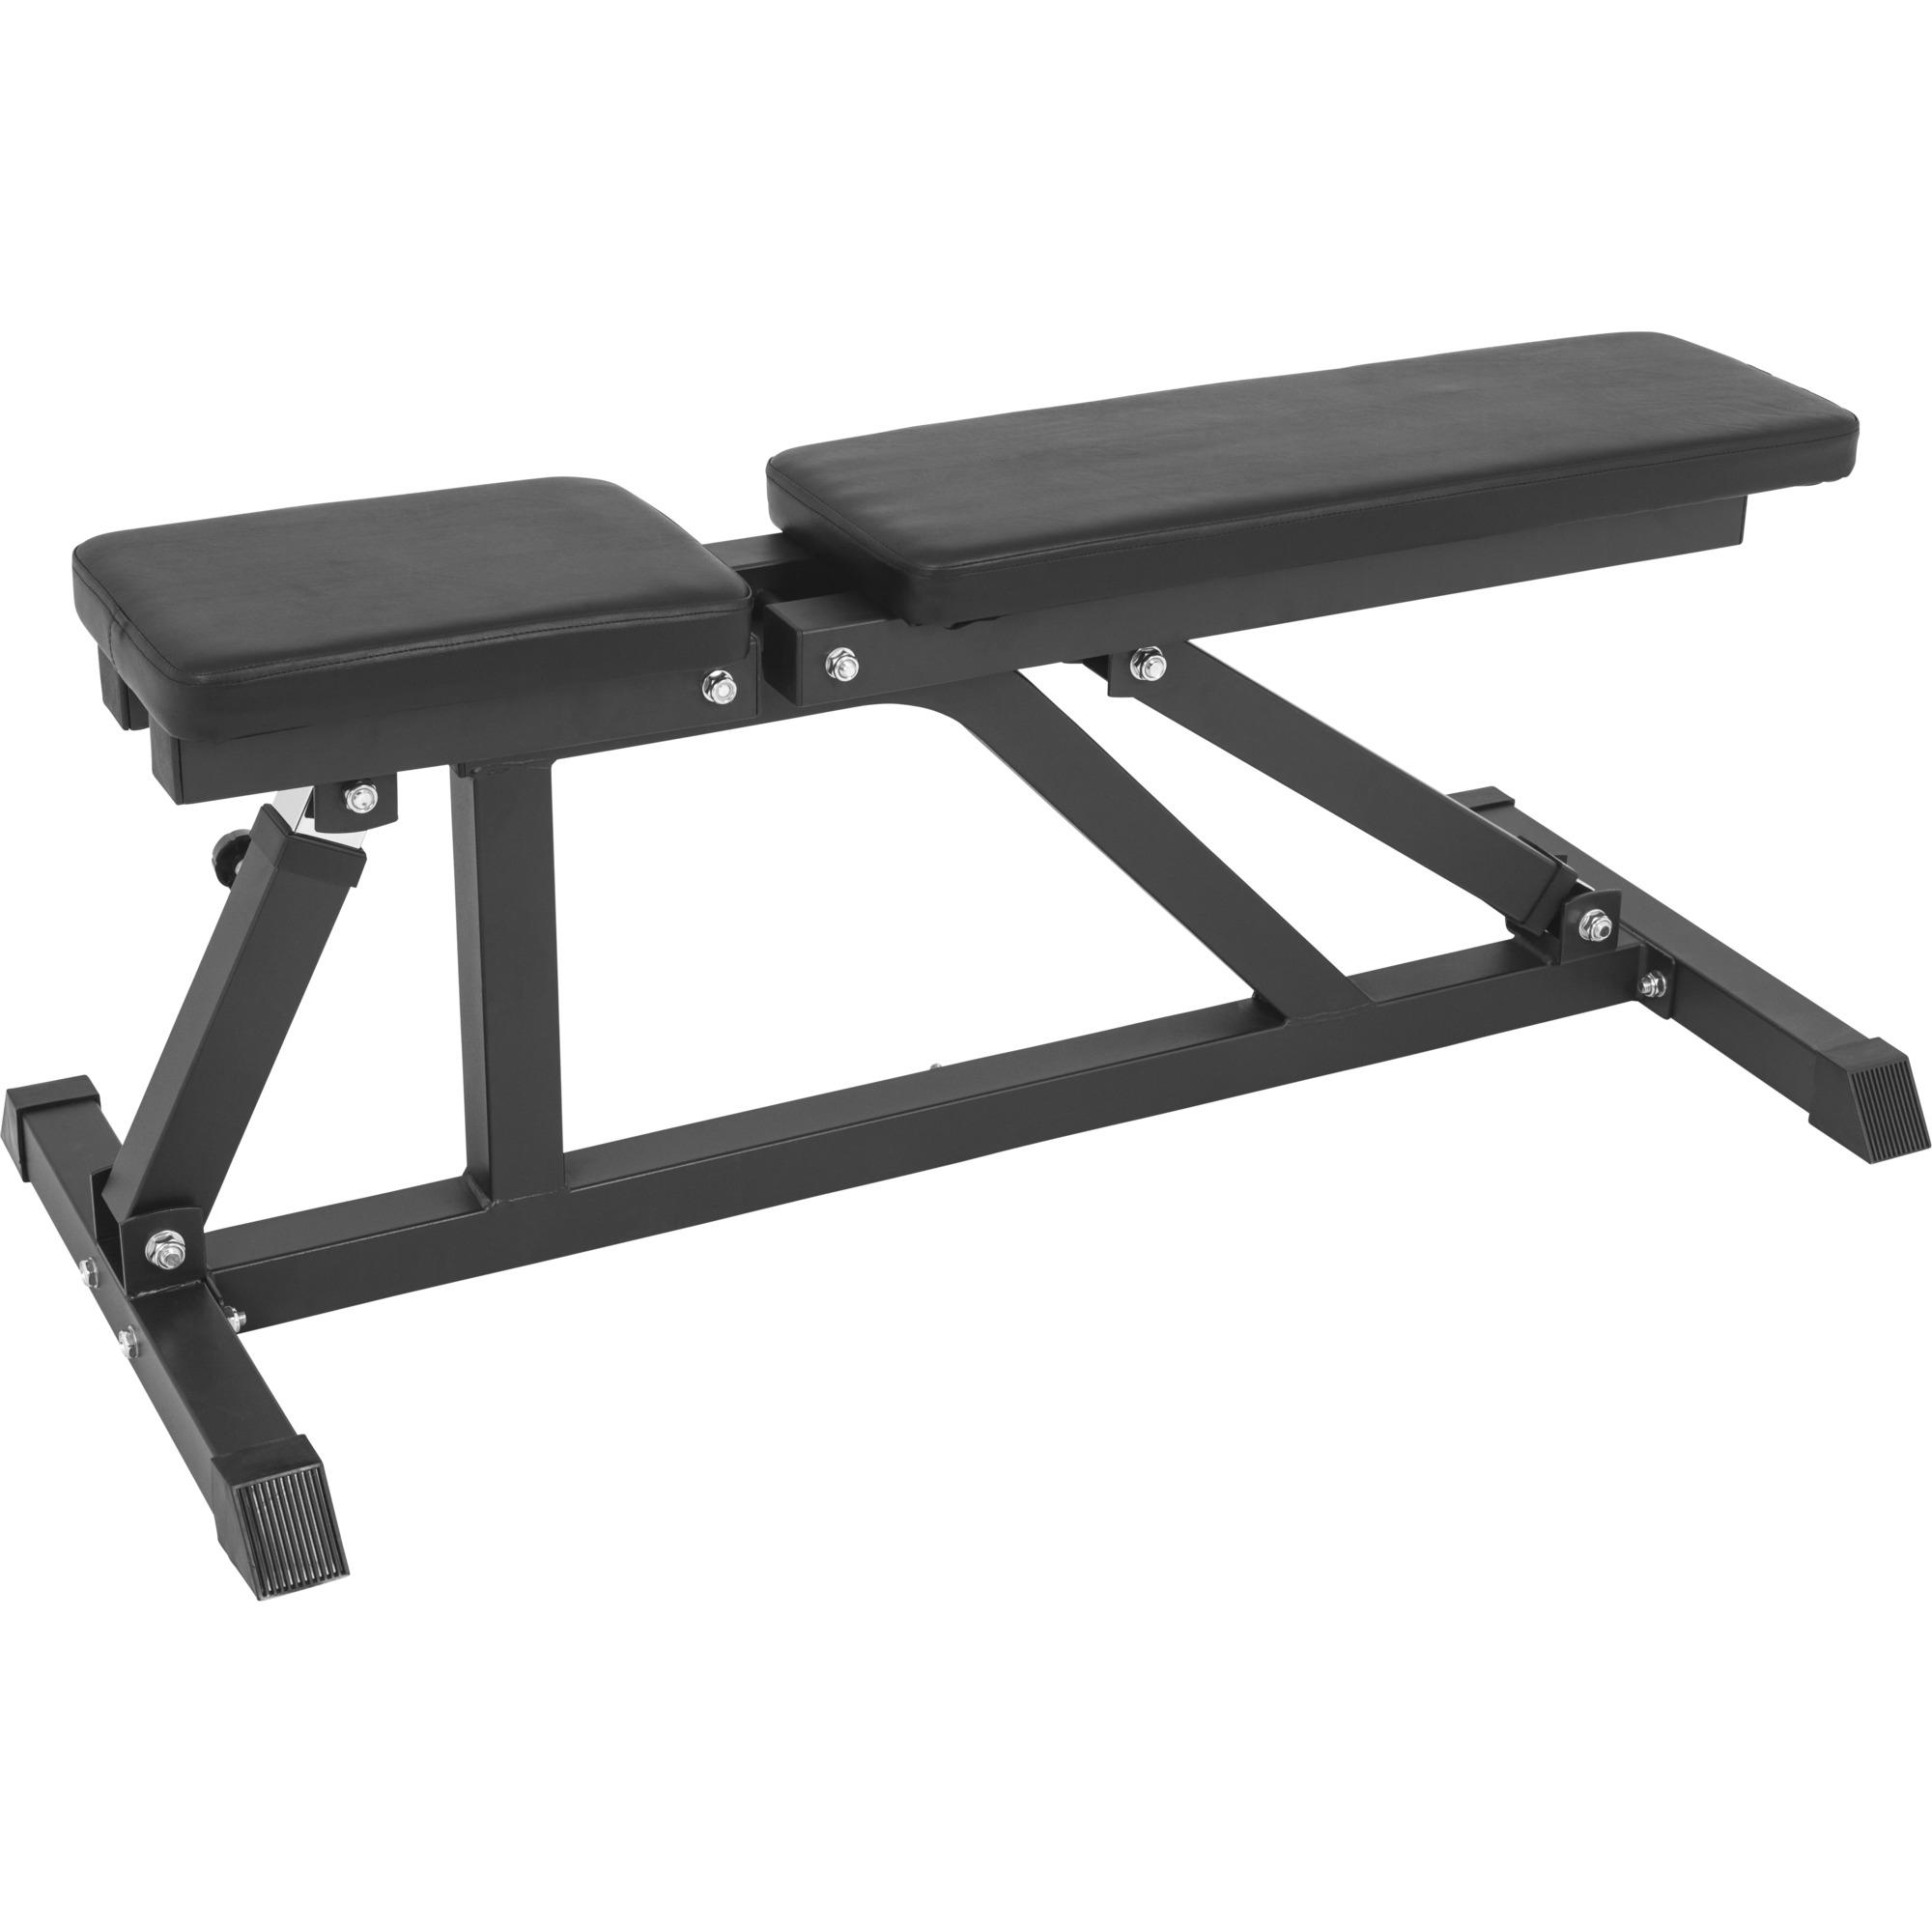 Gorilla sports banc de musculation multipositions noir ou blanc ebay - Banc de musculation gorilla sport ...